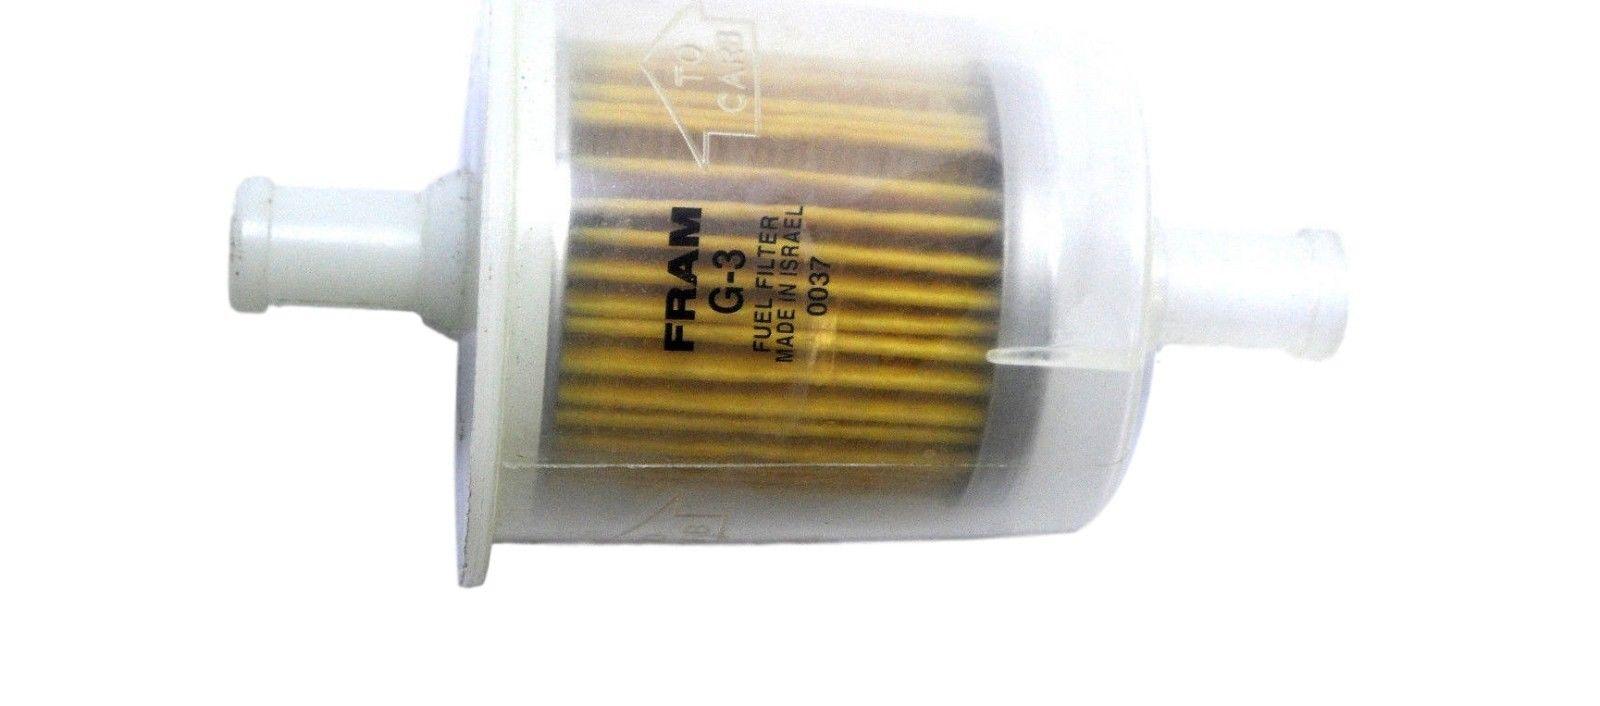 hight resolution of fram g3 g 3 fuel filter brand new ebay fram hpg1 fuel filter responsive image